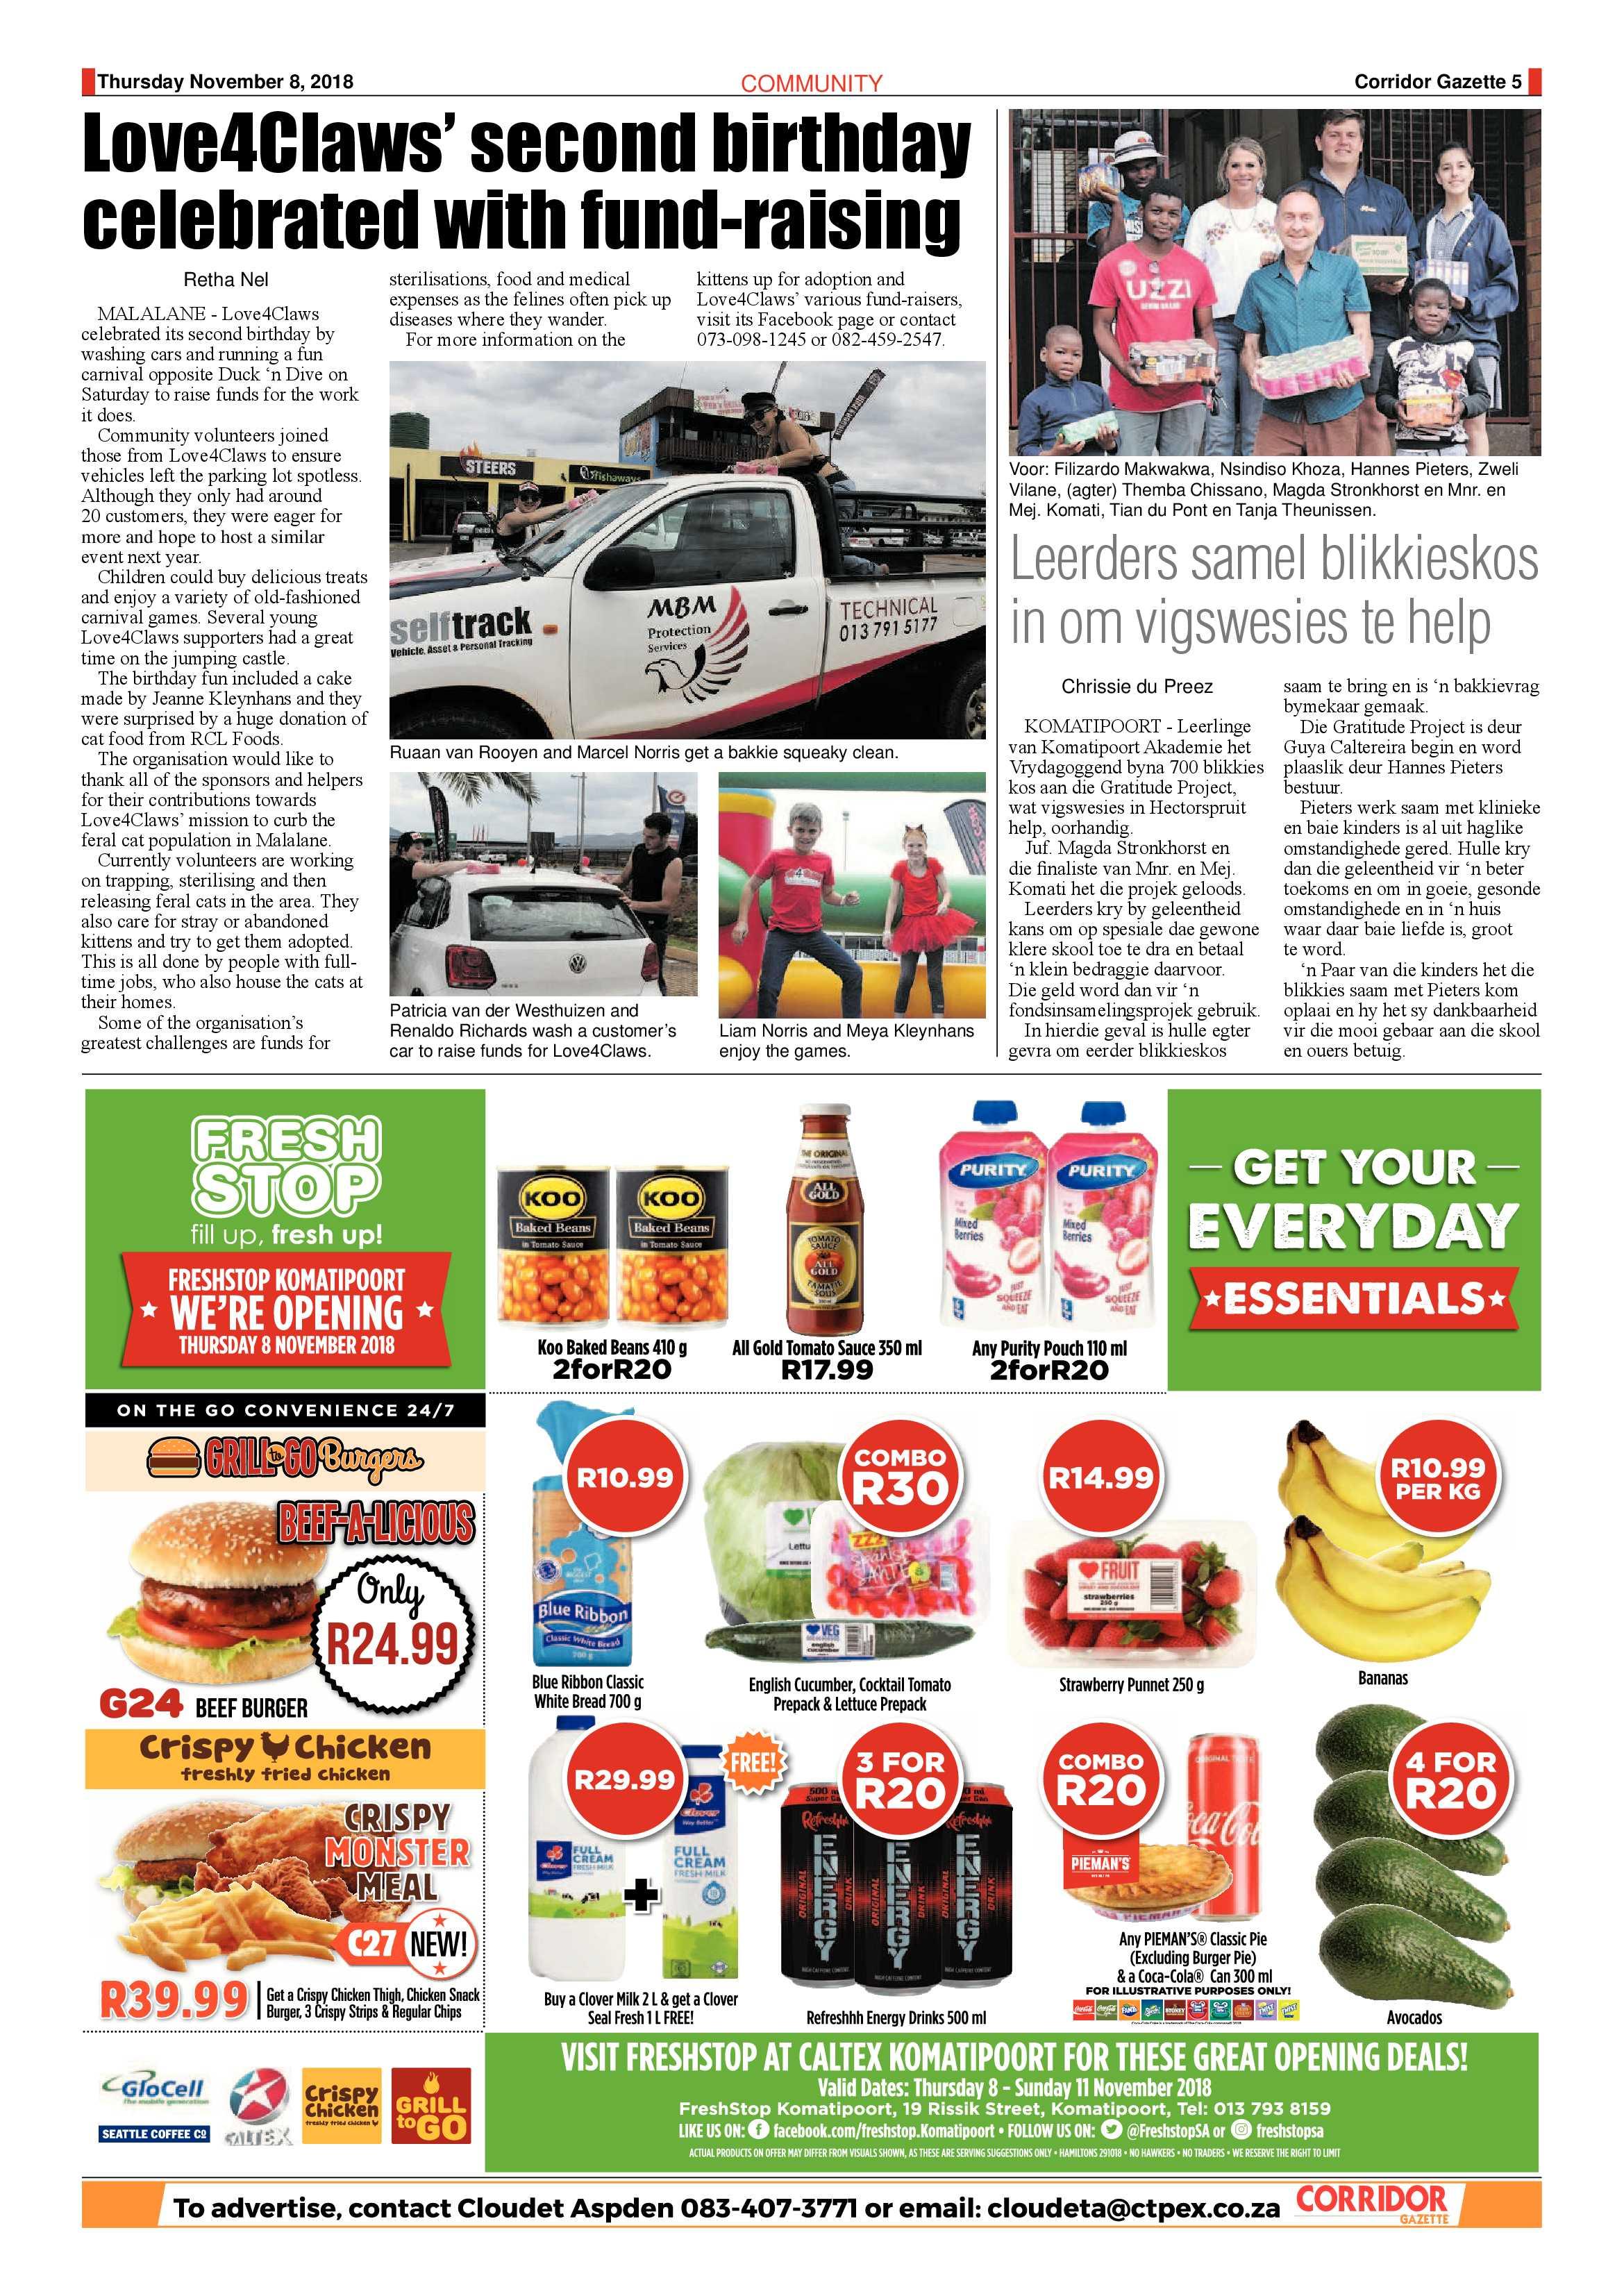 corridor-gazette-8-november-2018-epapers-page-5